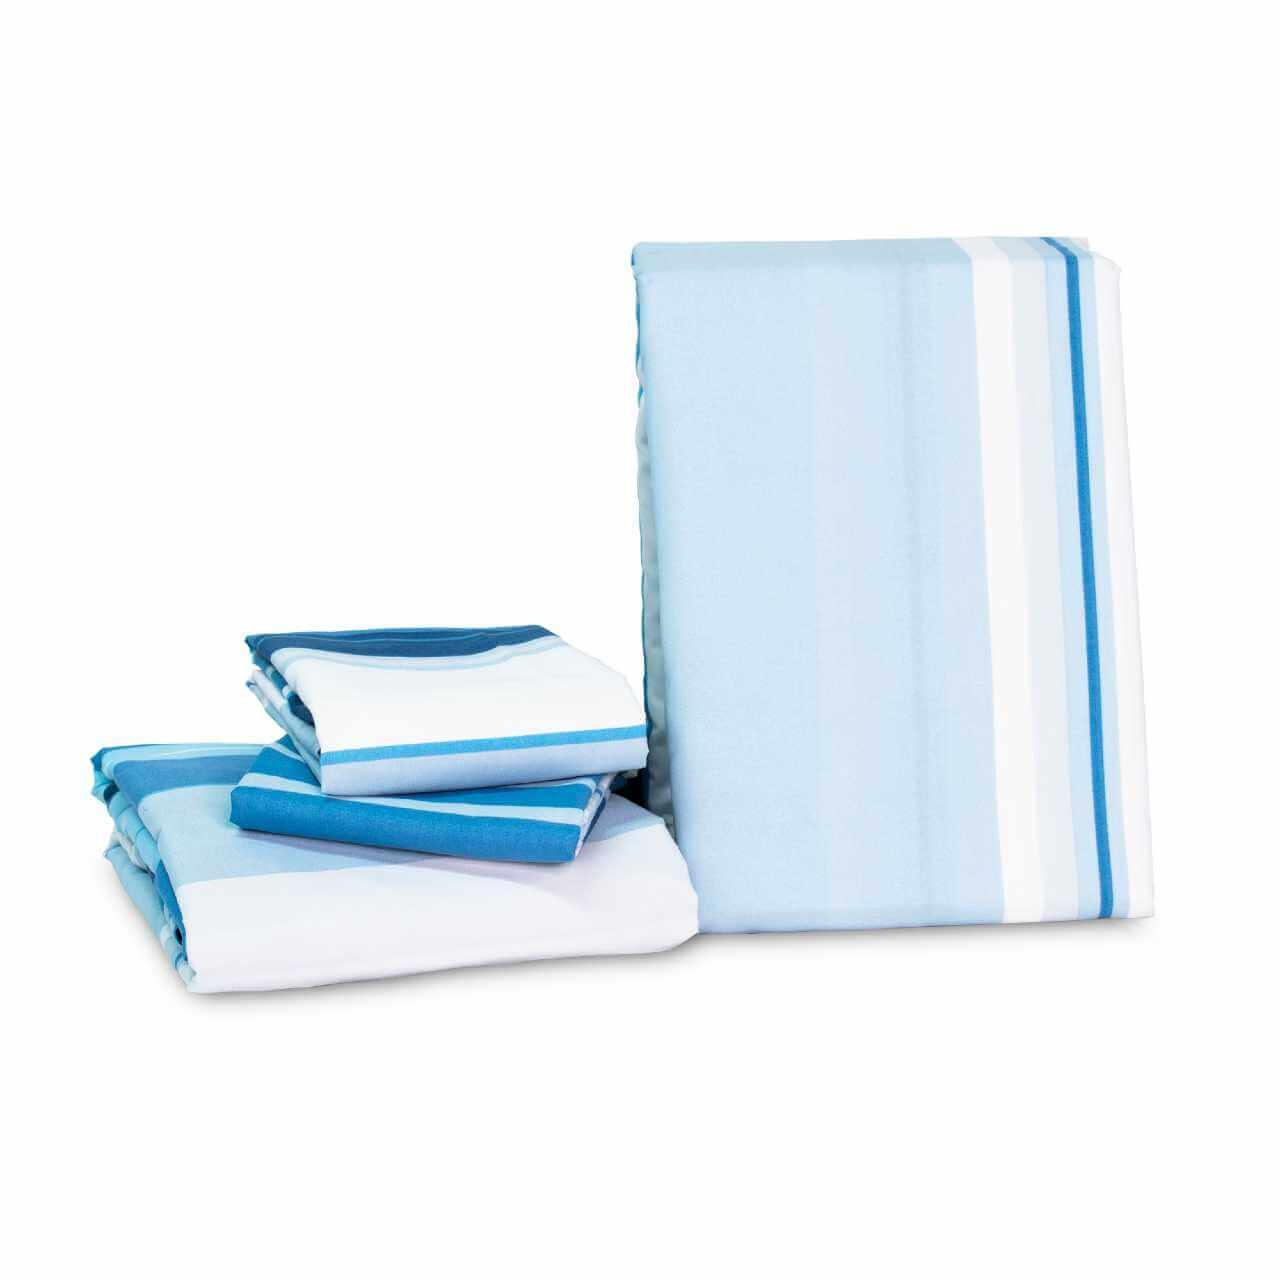 Juego de Sábanas Casa Real Tex - Lineas Azules